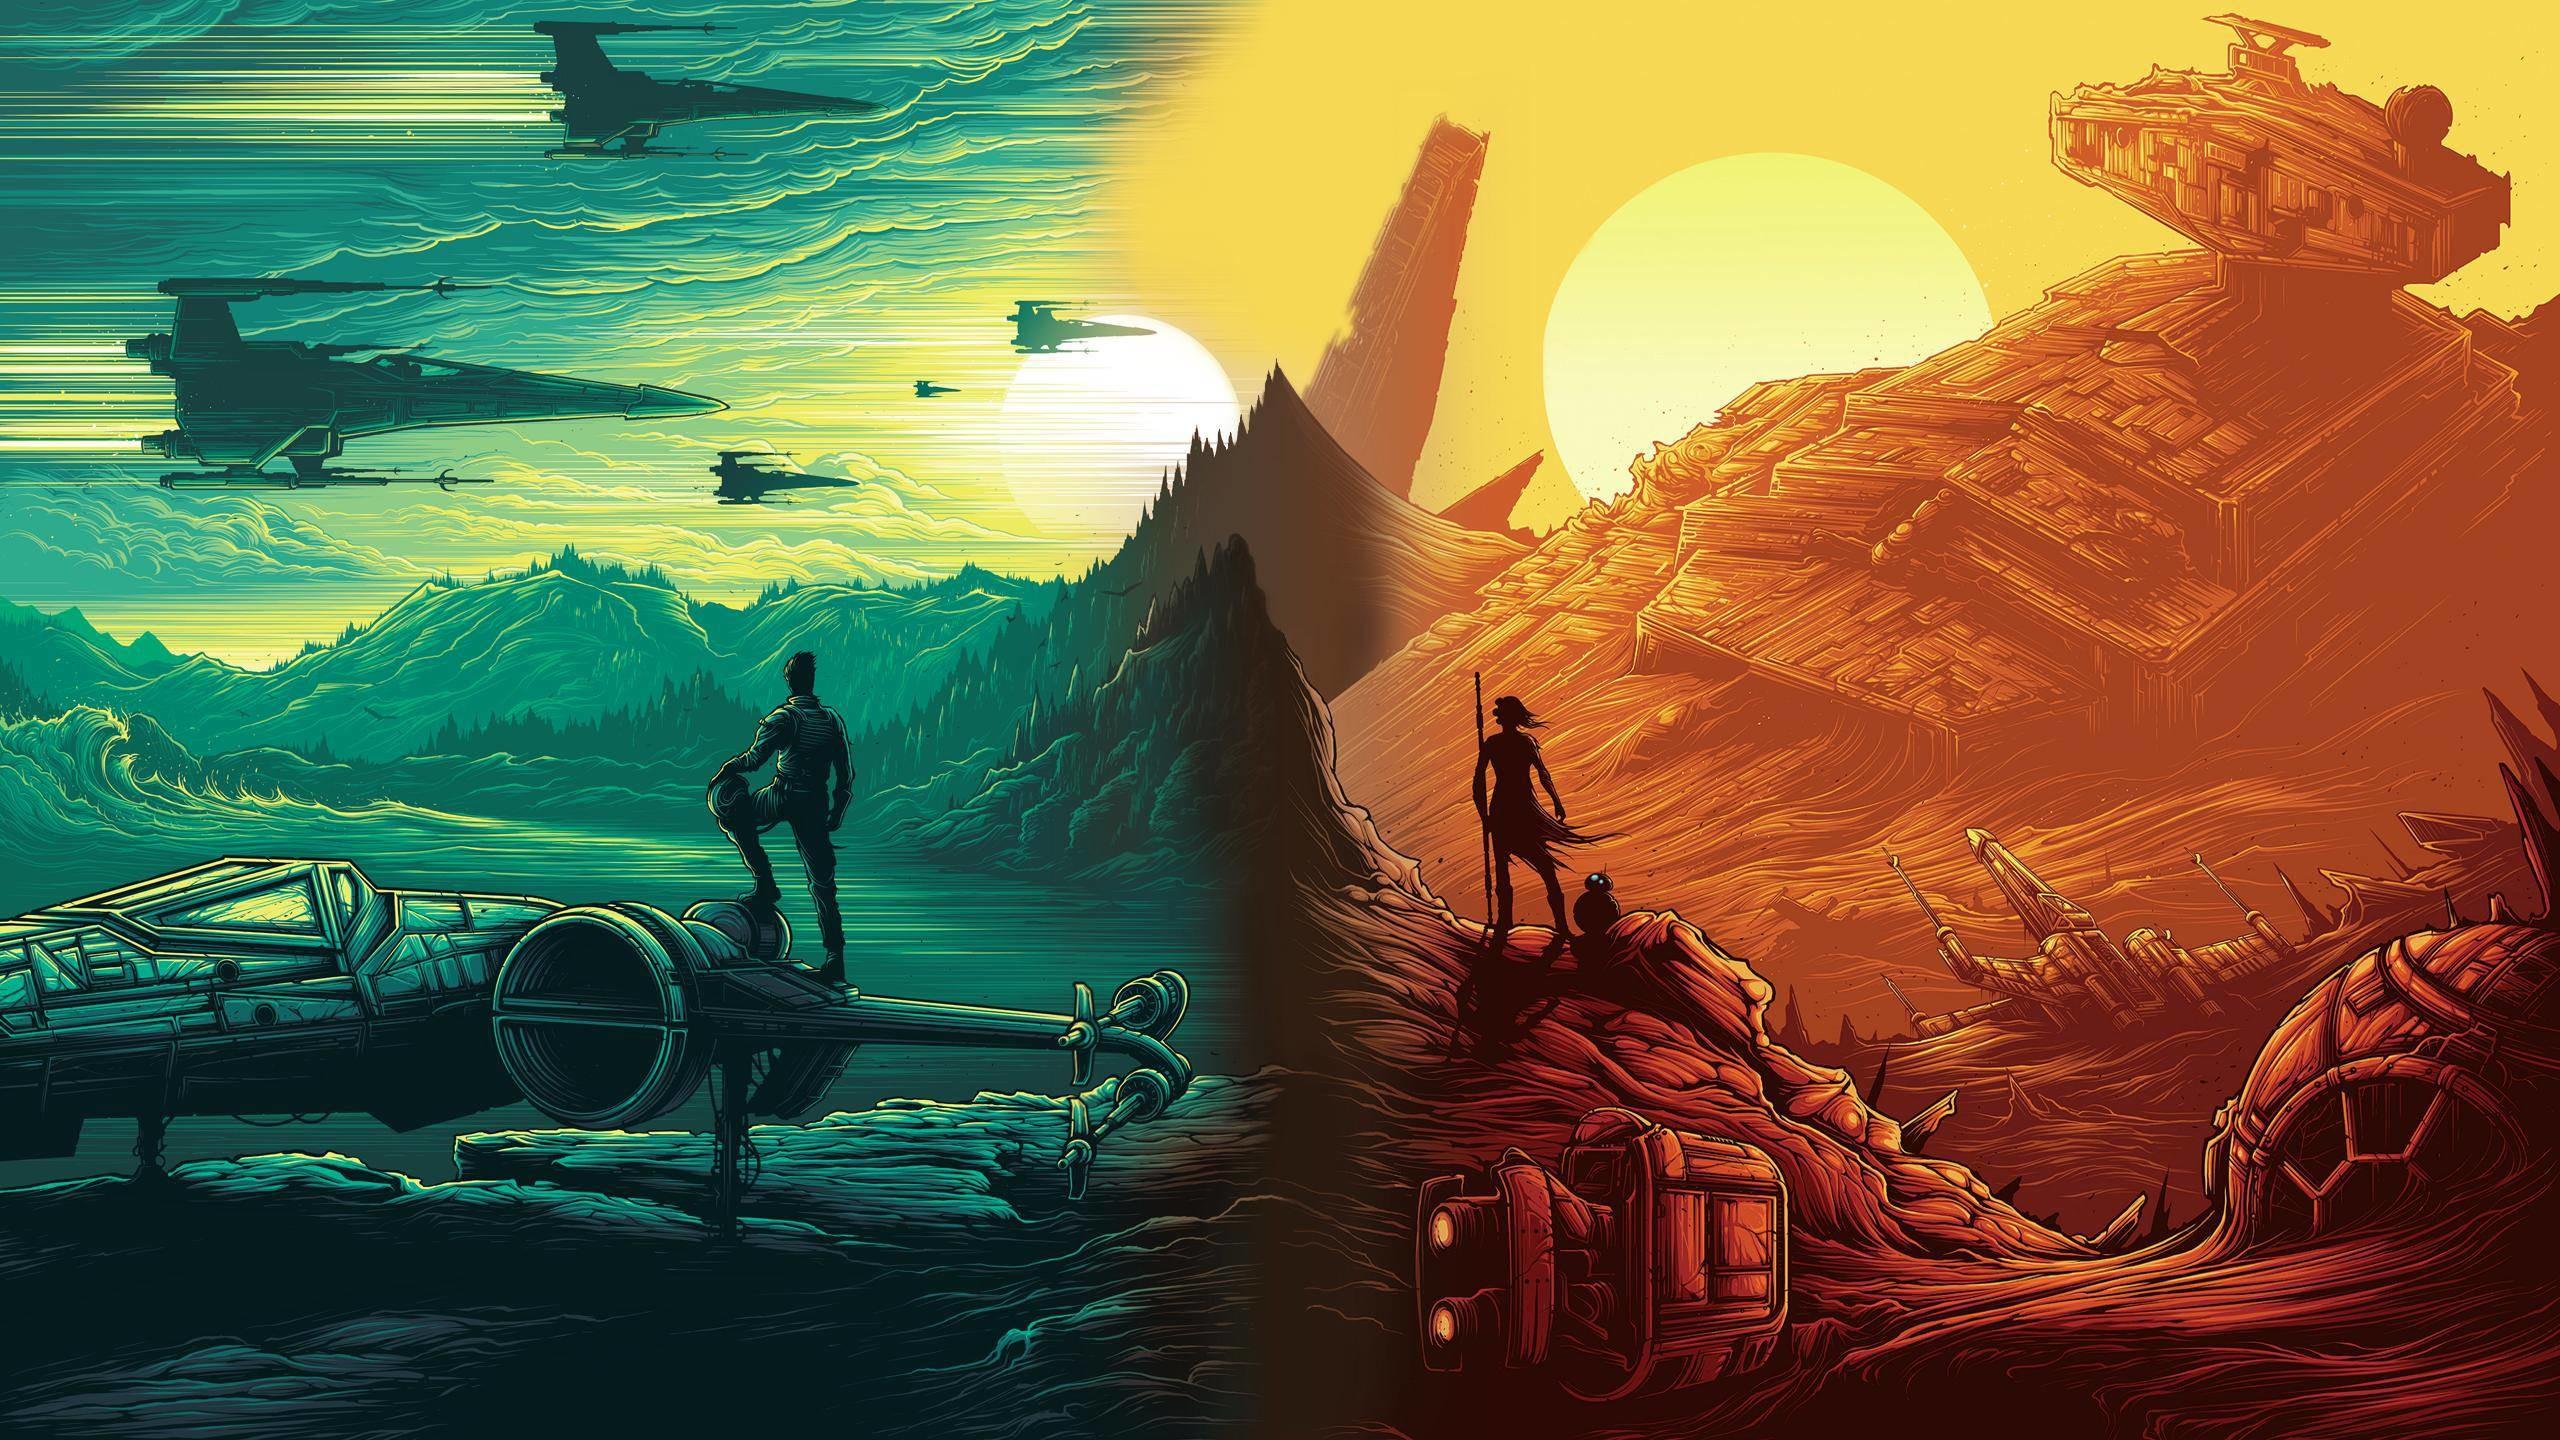 Star Wars Wallpapers Full Hd